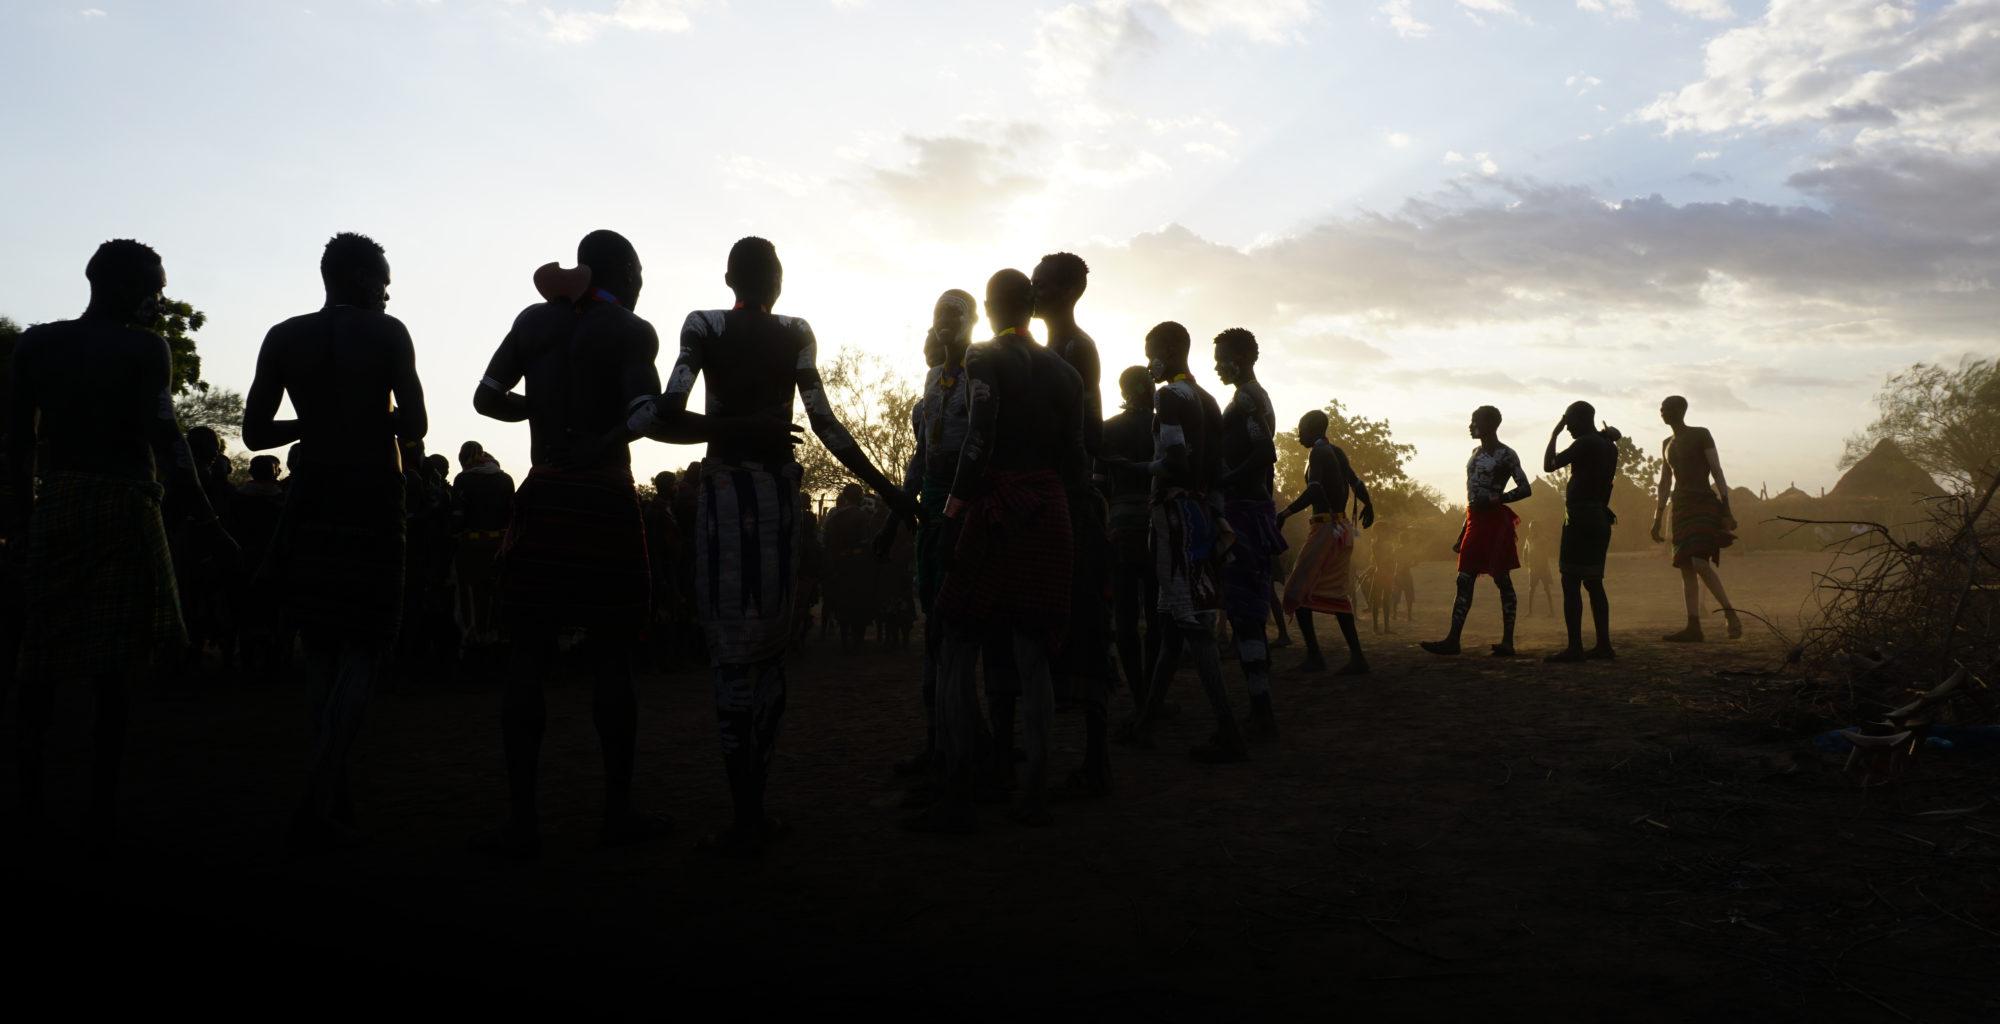 Kara dancing in the Omo Valley by Will Jones